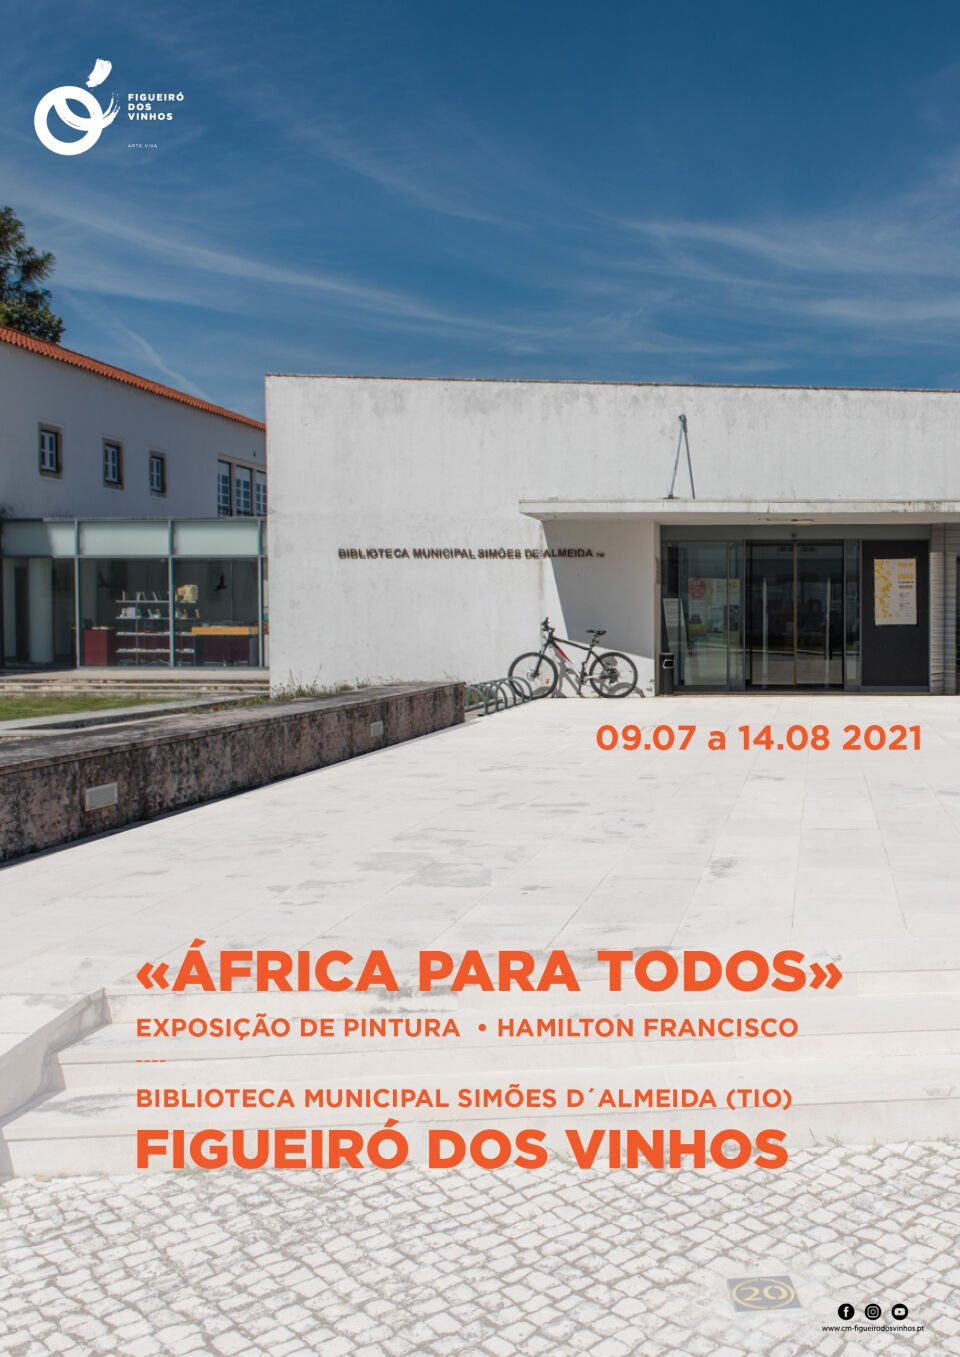 Exposição de Pintura de Hamilton Francisco - Nô pincha! «África para todos»